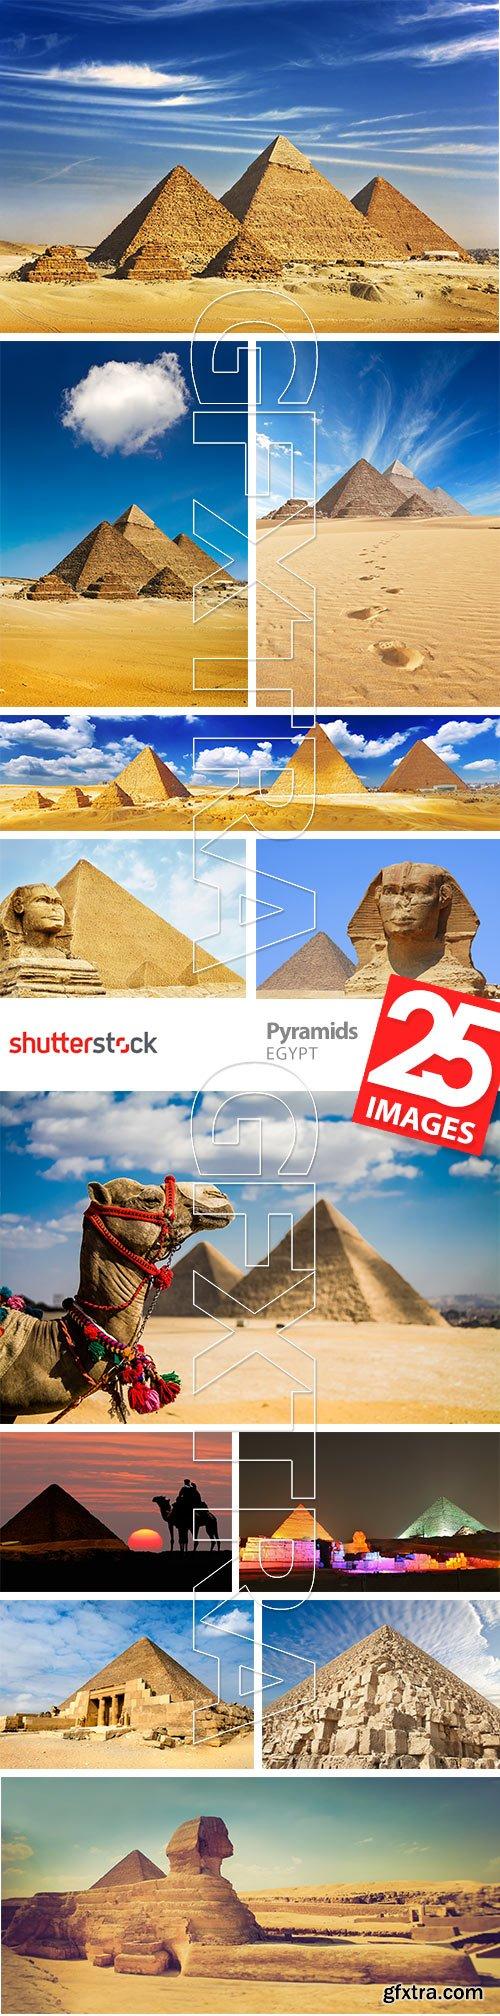 Pyramids EGYPT 25xJPG